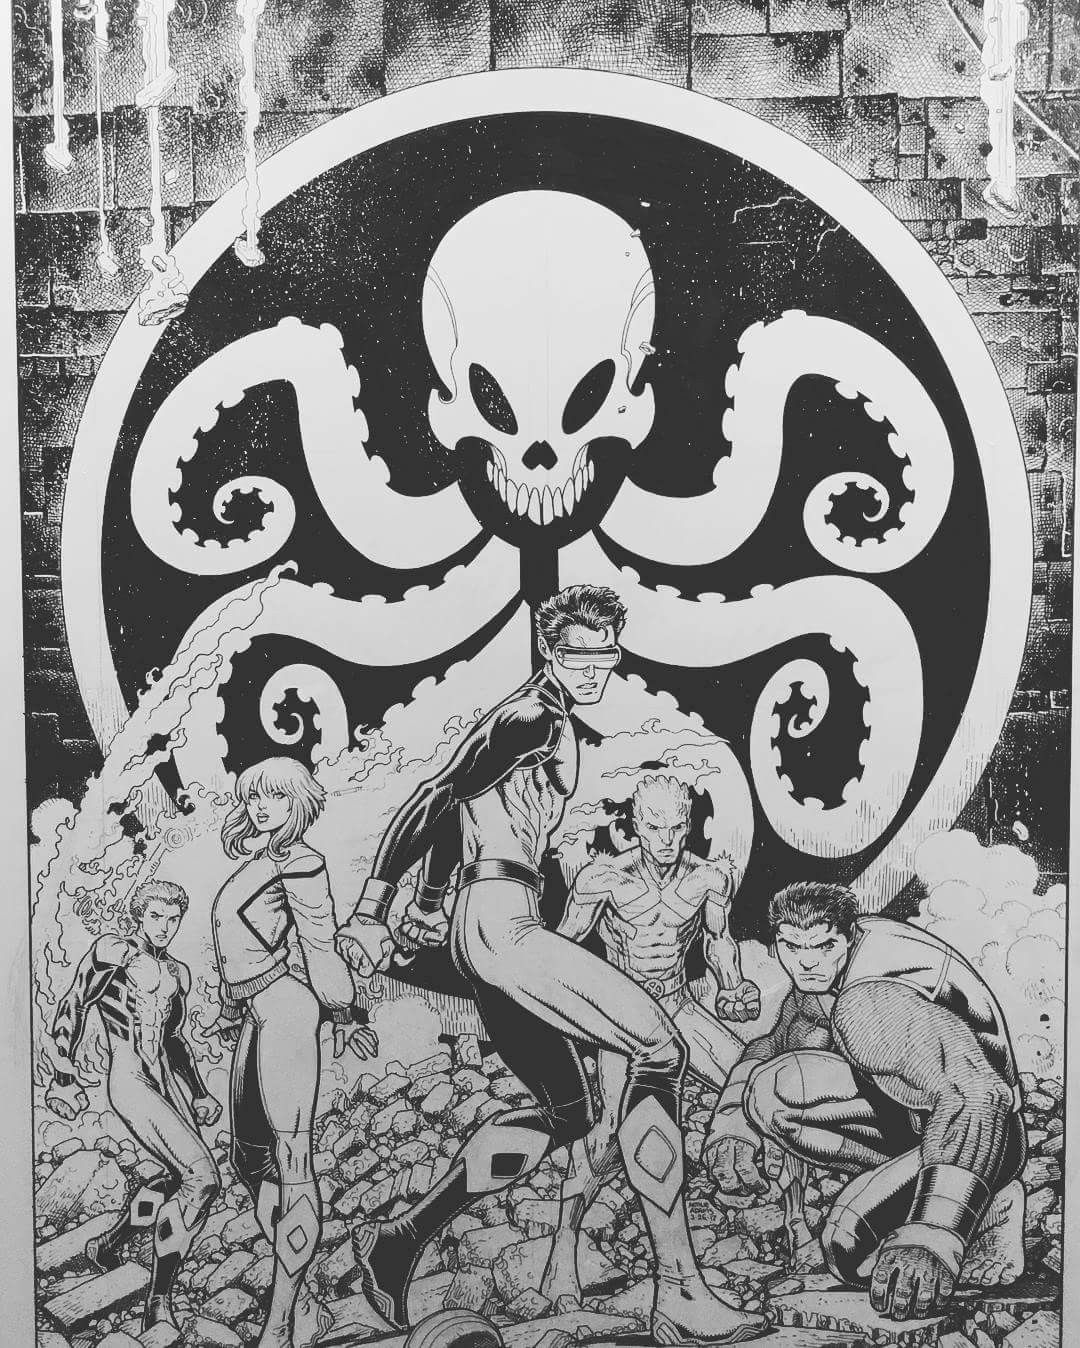 X-Men Blue #7 B+W - Arthur Adams | Marvel Comics Characters